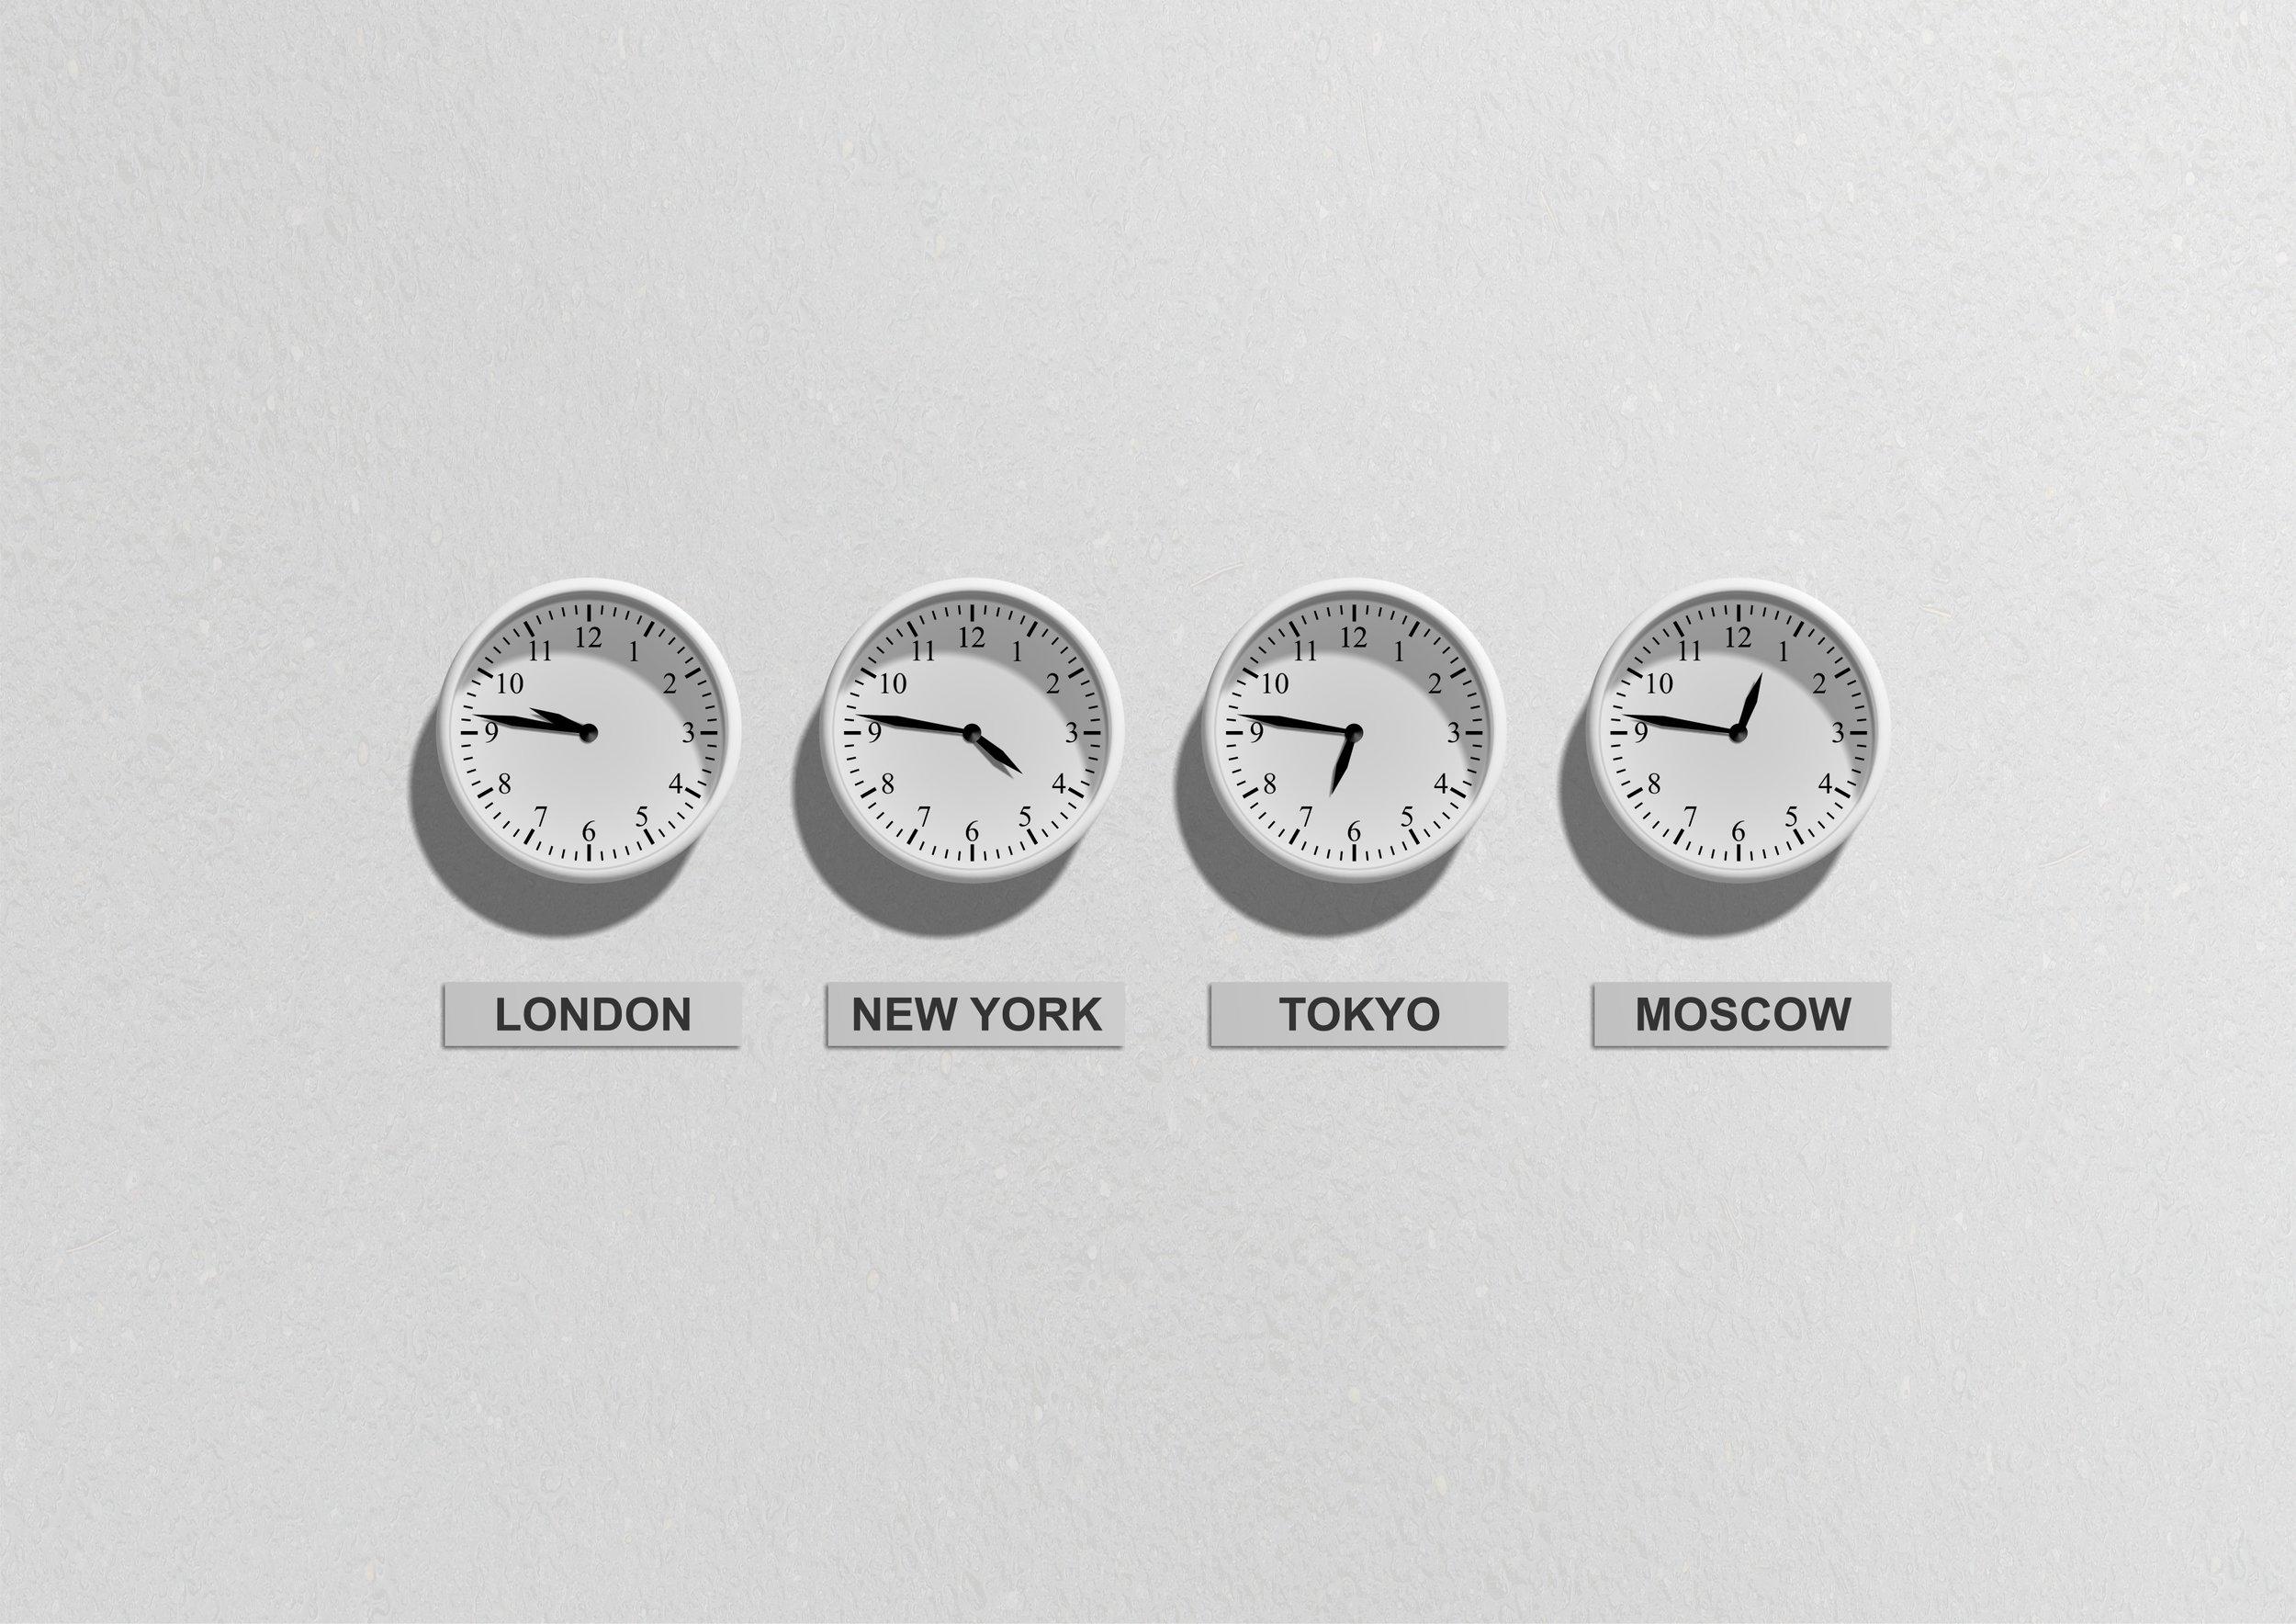 business-time-clock-clocks-48770